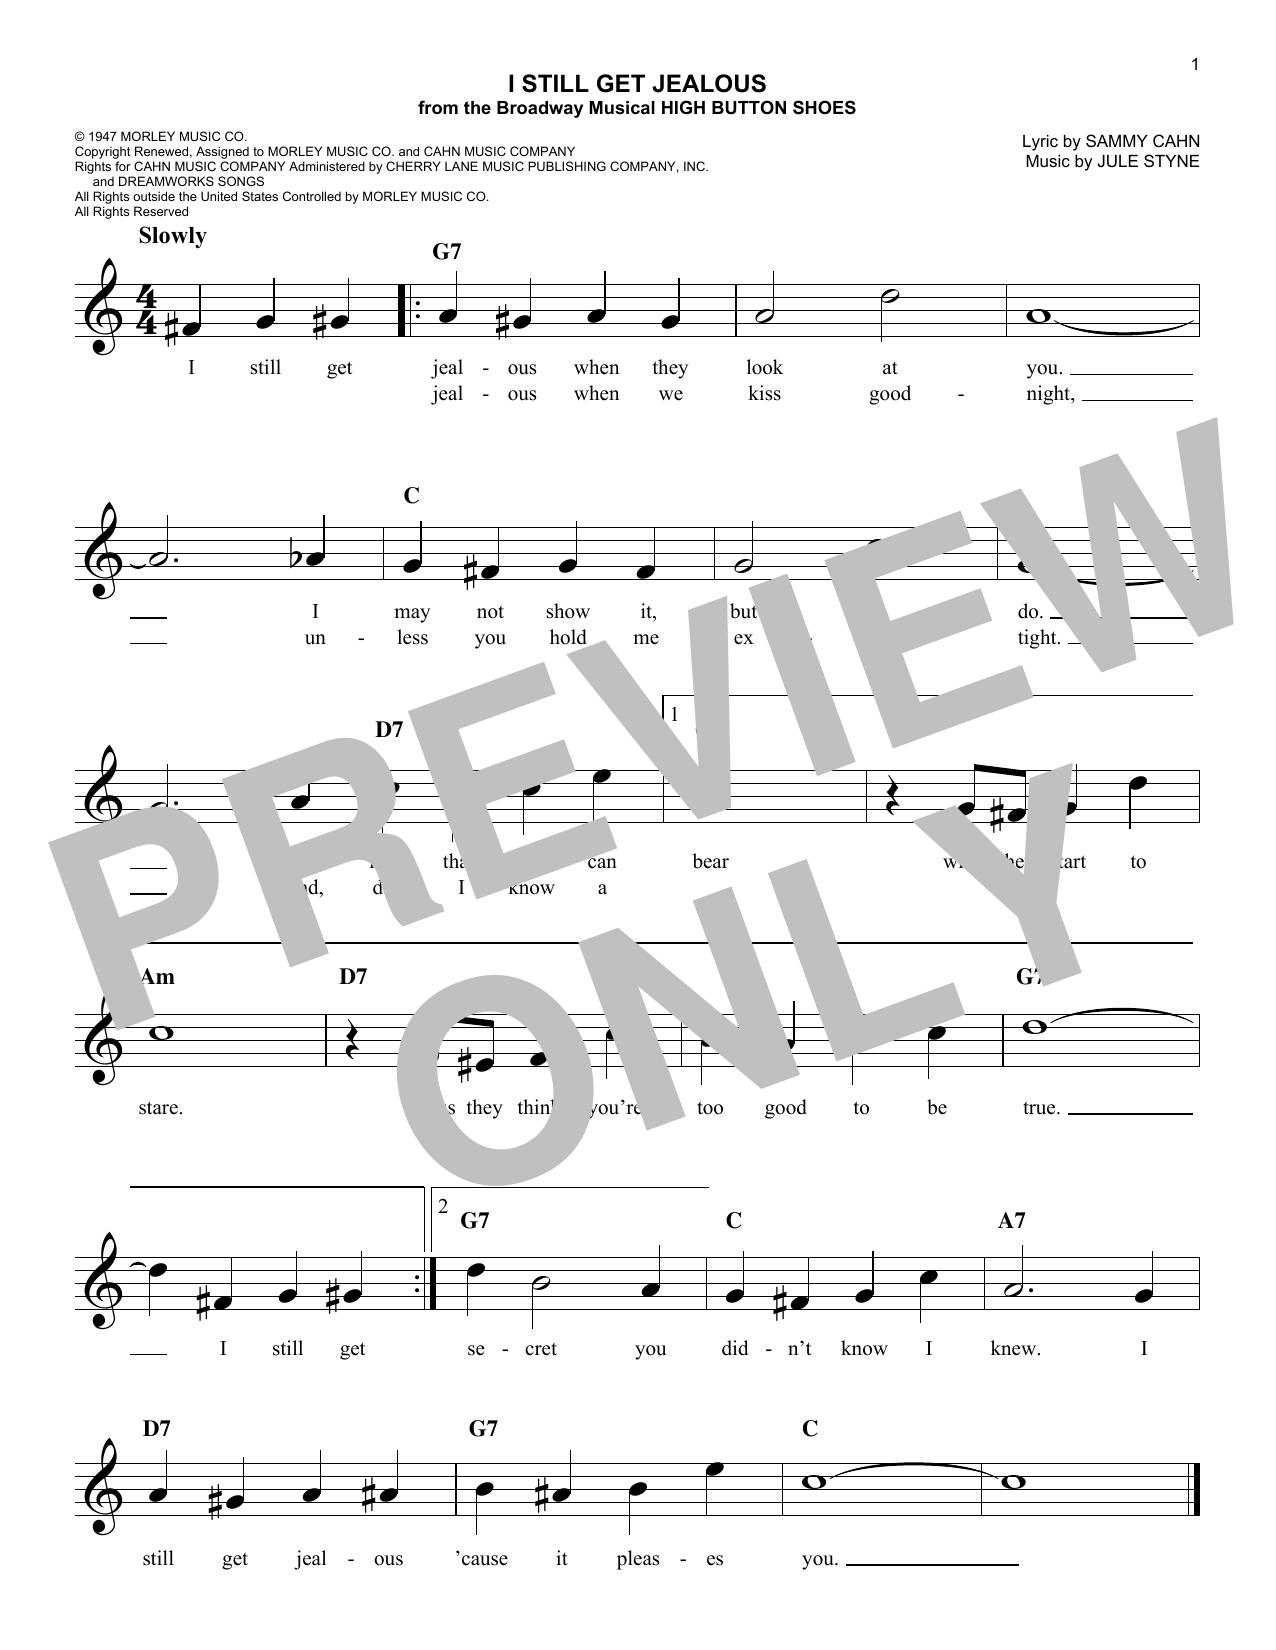 Sammy Cahn I Still Get Jealous sheet music notes and chords. Download Printable PDF.